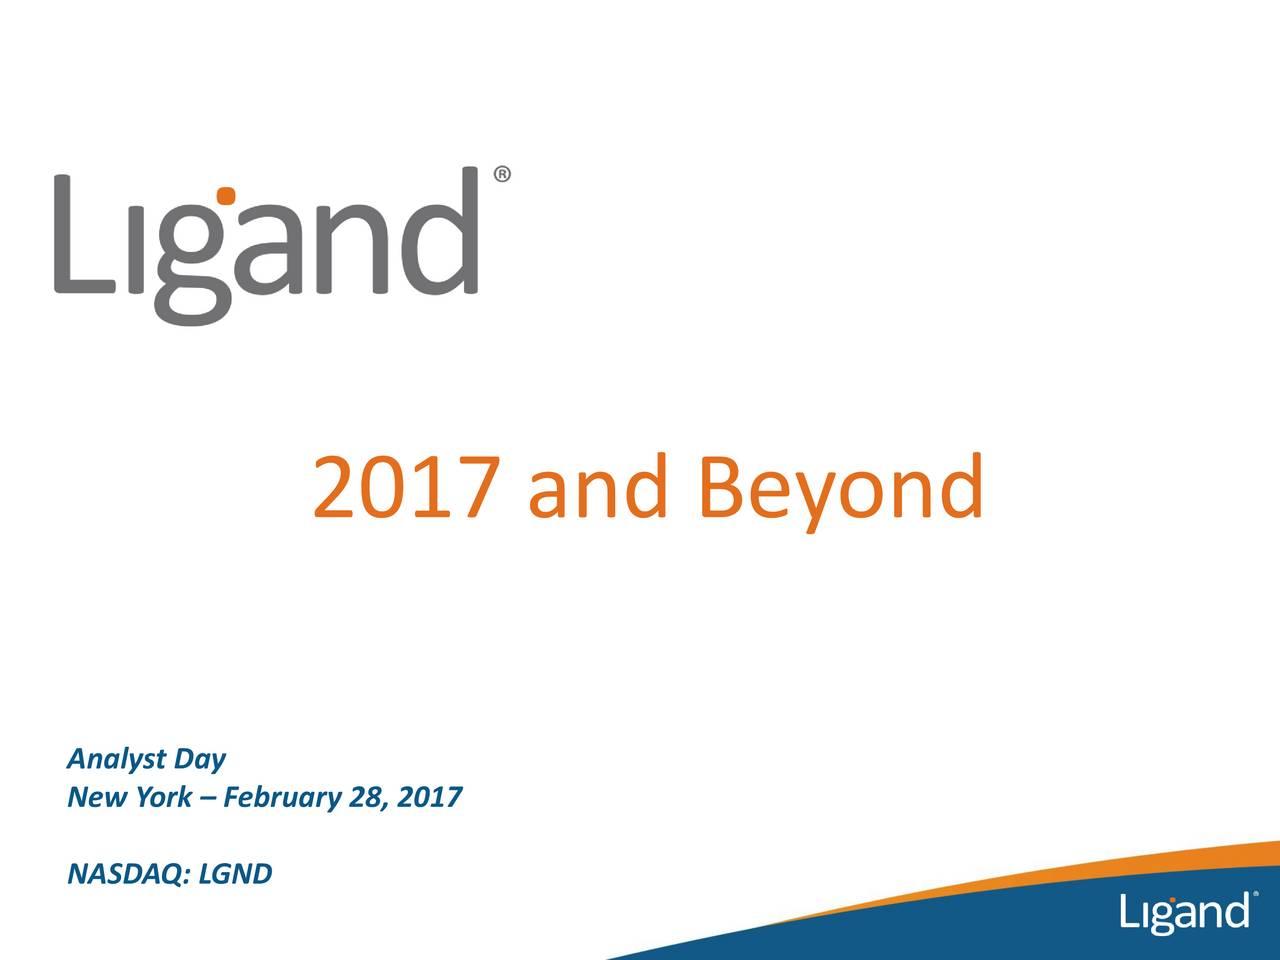 Analyst Day New York  February 28, 2017 NASDAQ: LGND